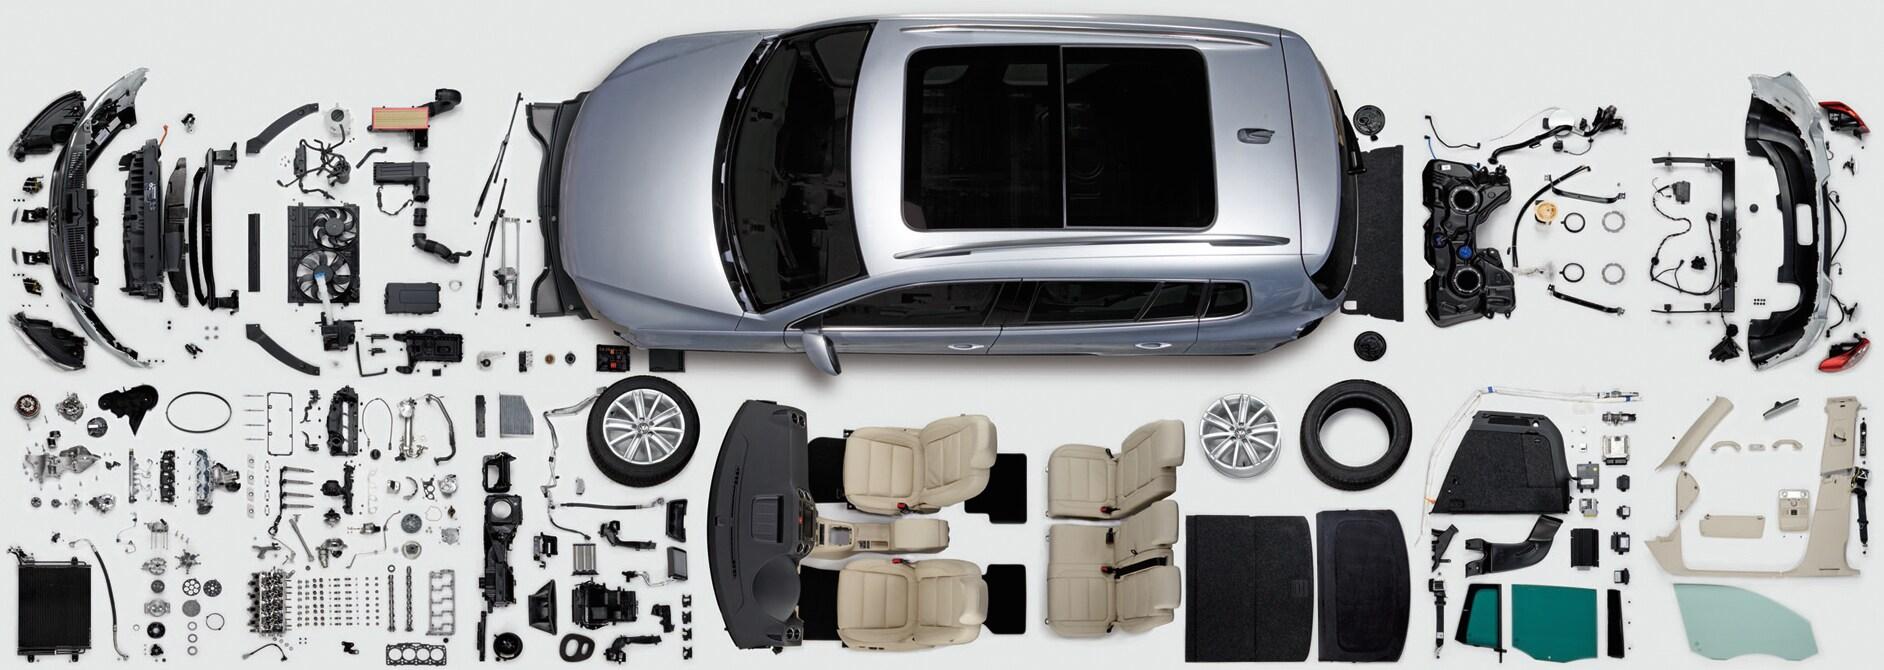 Vw Parts Specials In Downers Grove Il Pugi Volkswagen